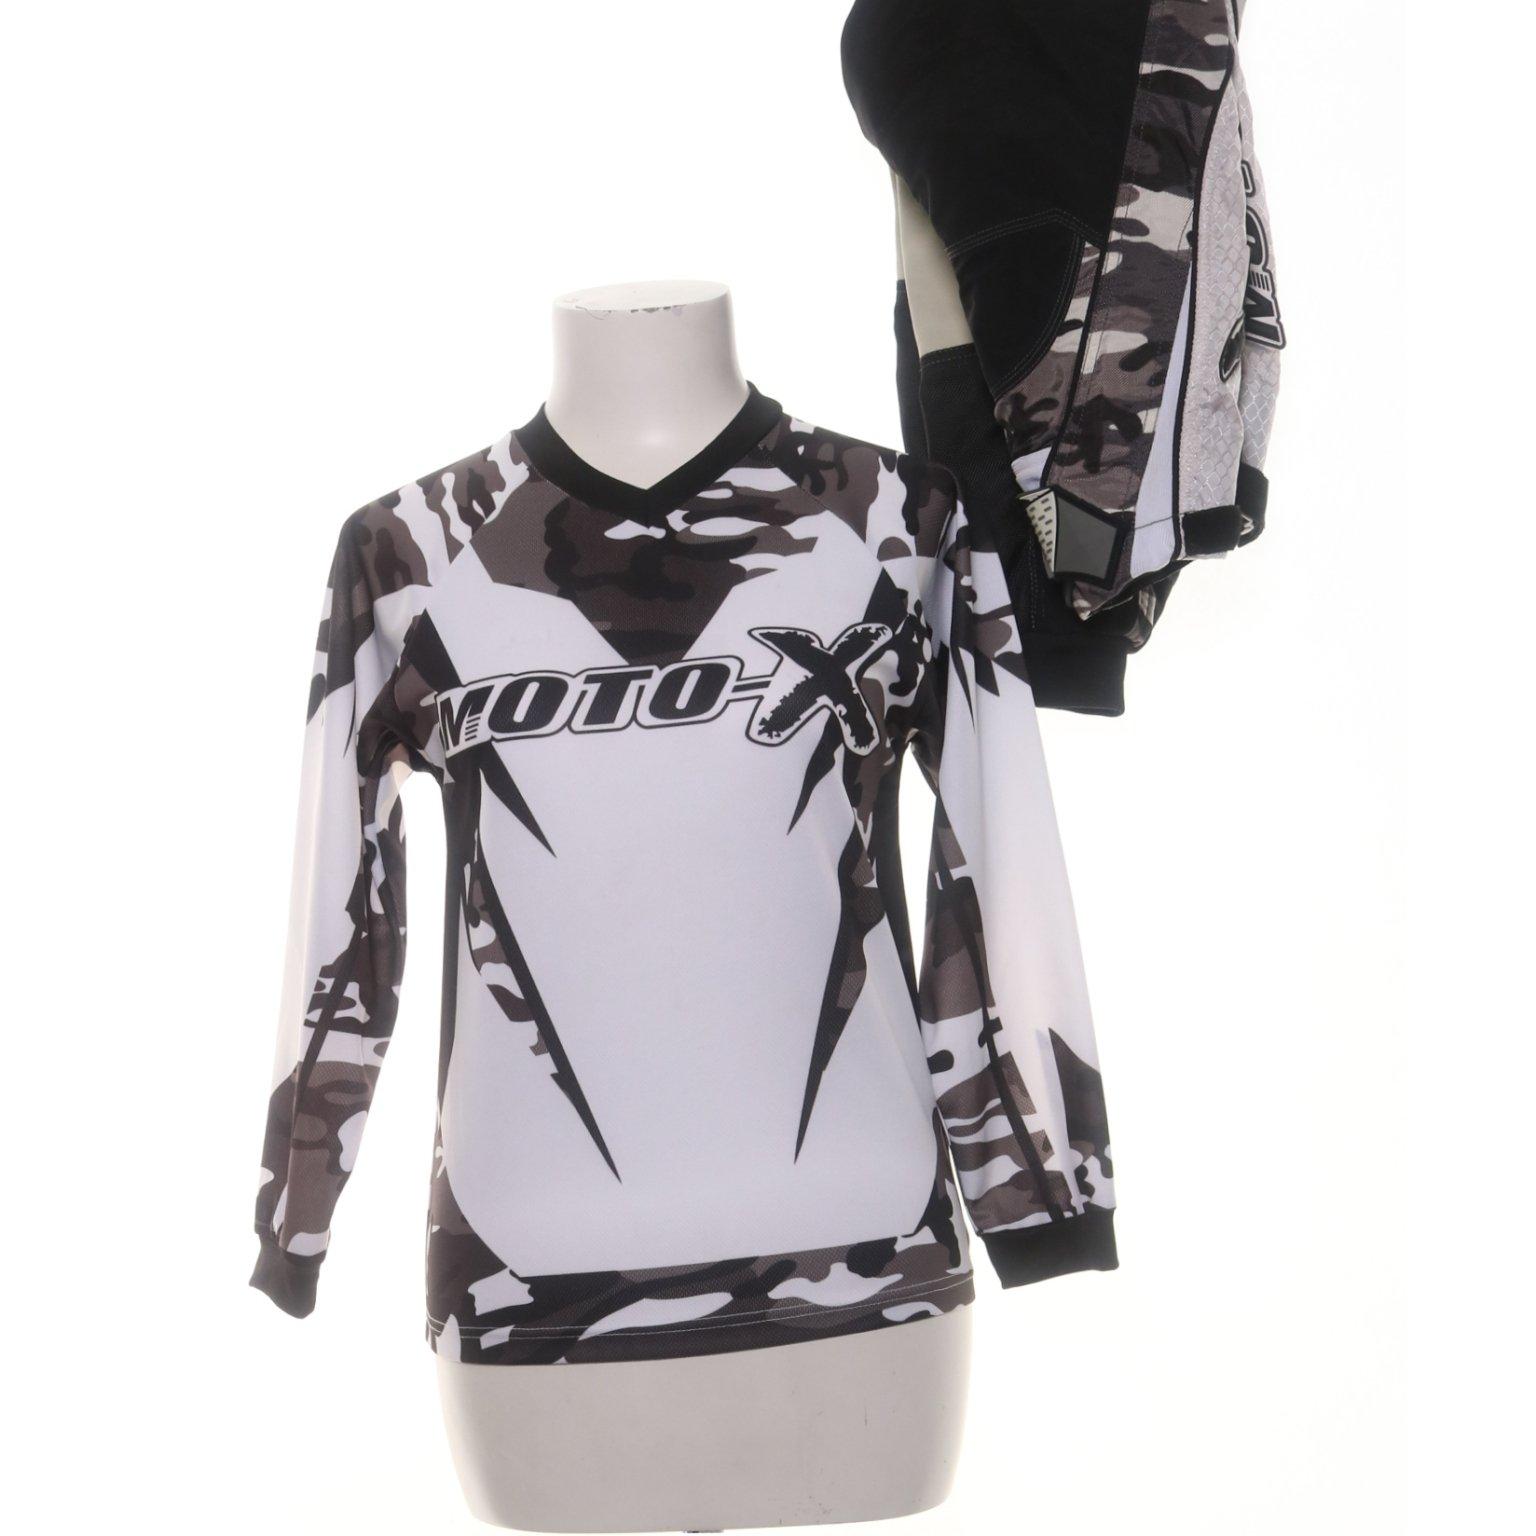 första kurs onlinebutik 100% hög kvalitet biltema tröja